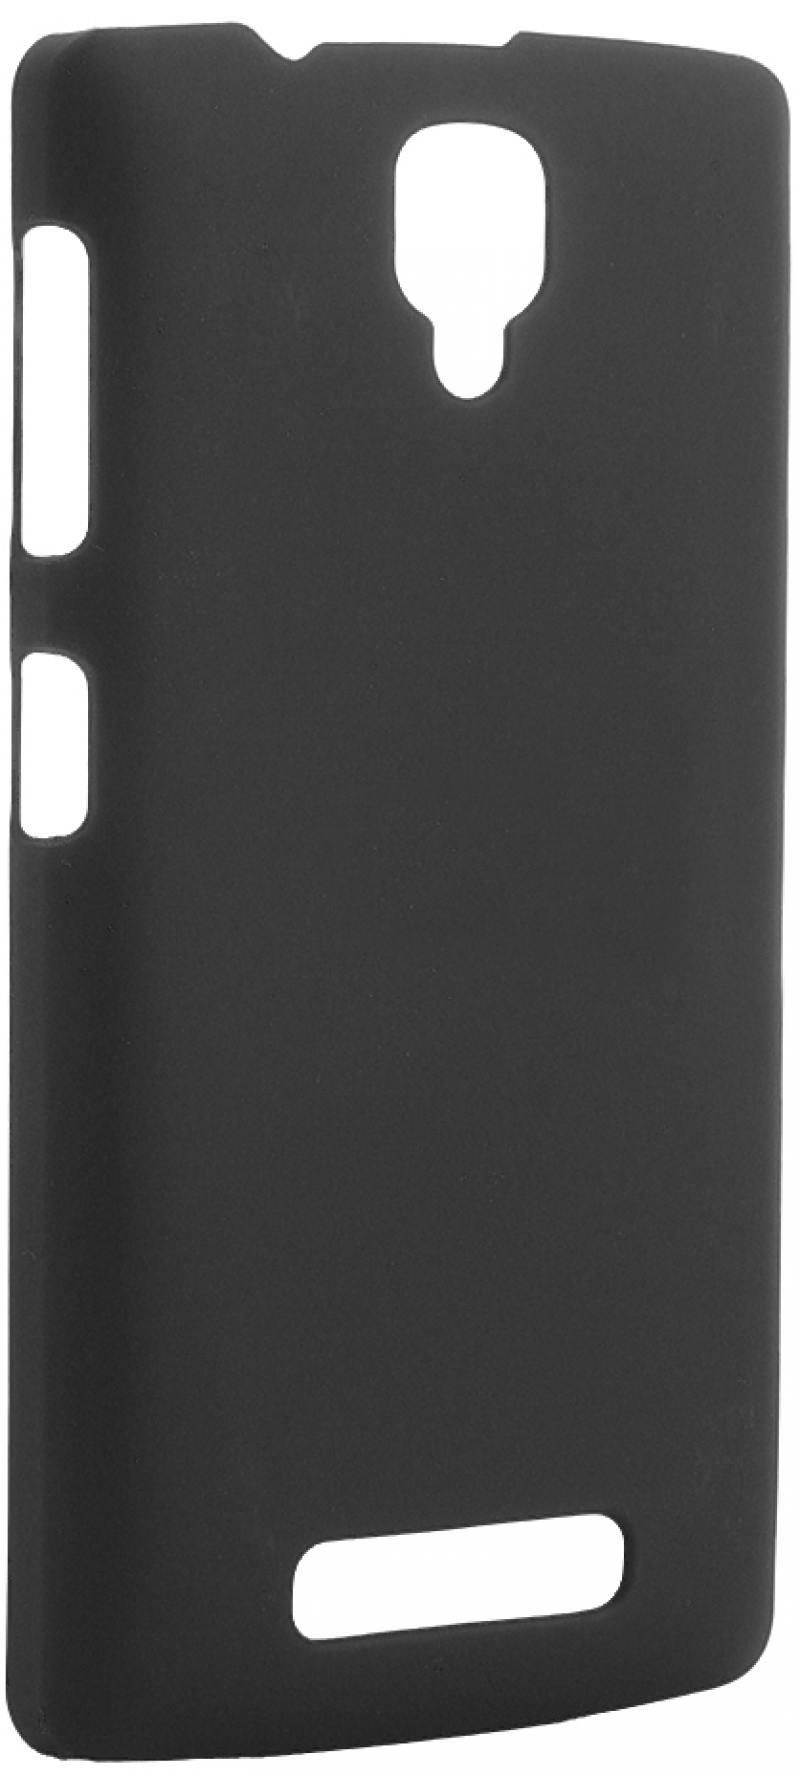 Чехол-накладка Pulsar CLIPCASE PC Soft-Touch для Lenovo A1000 (черная) чехол для lenovo a1000 силиконовый tpu белый 0 3 мм коллекция green cases